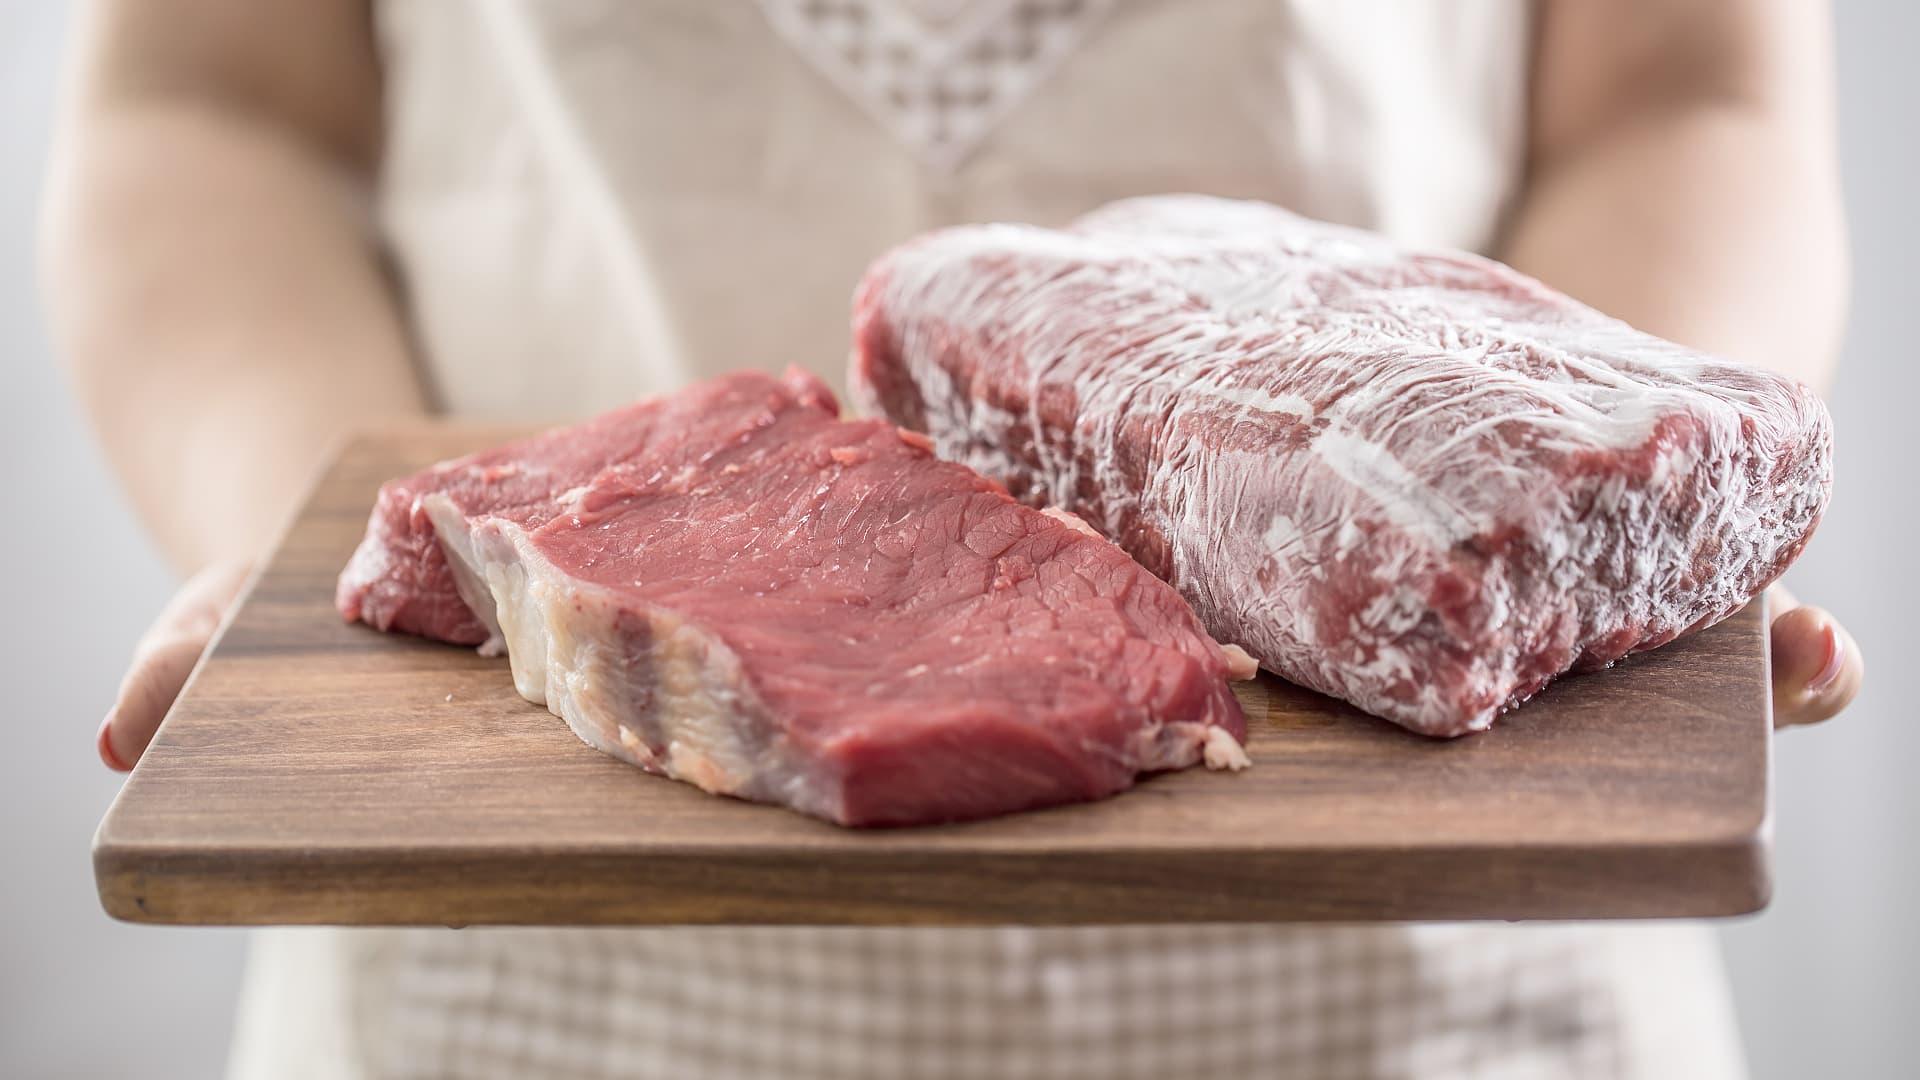 Is Corona virus spread through frozen meat?